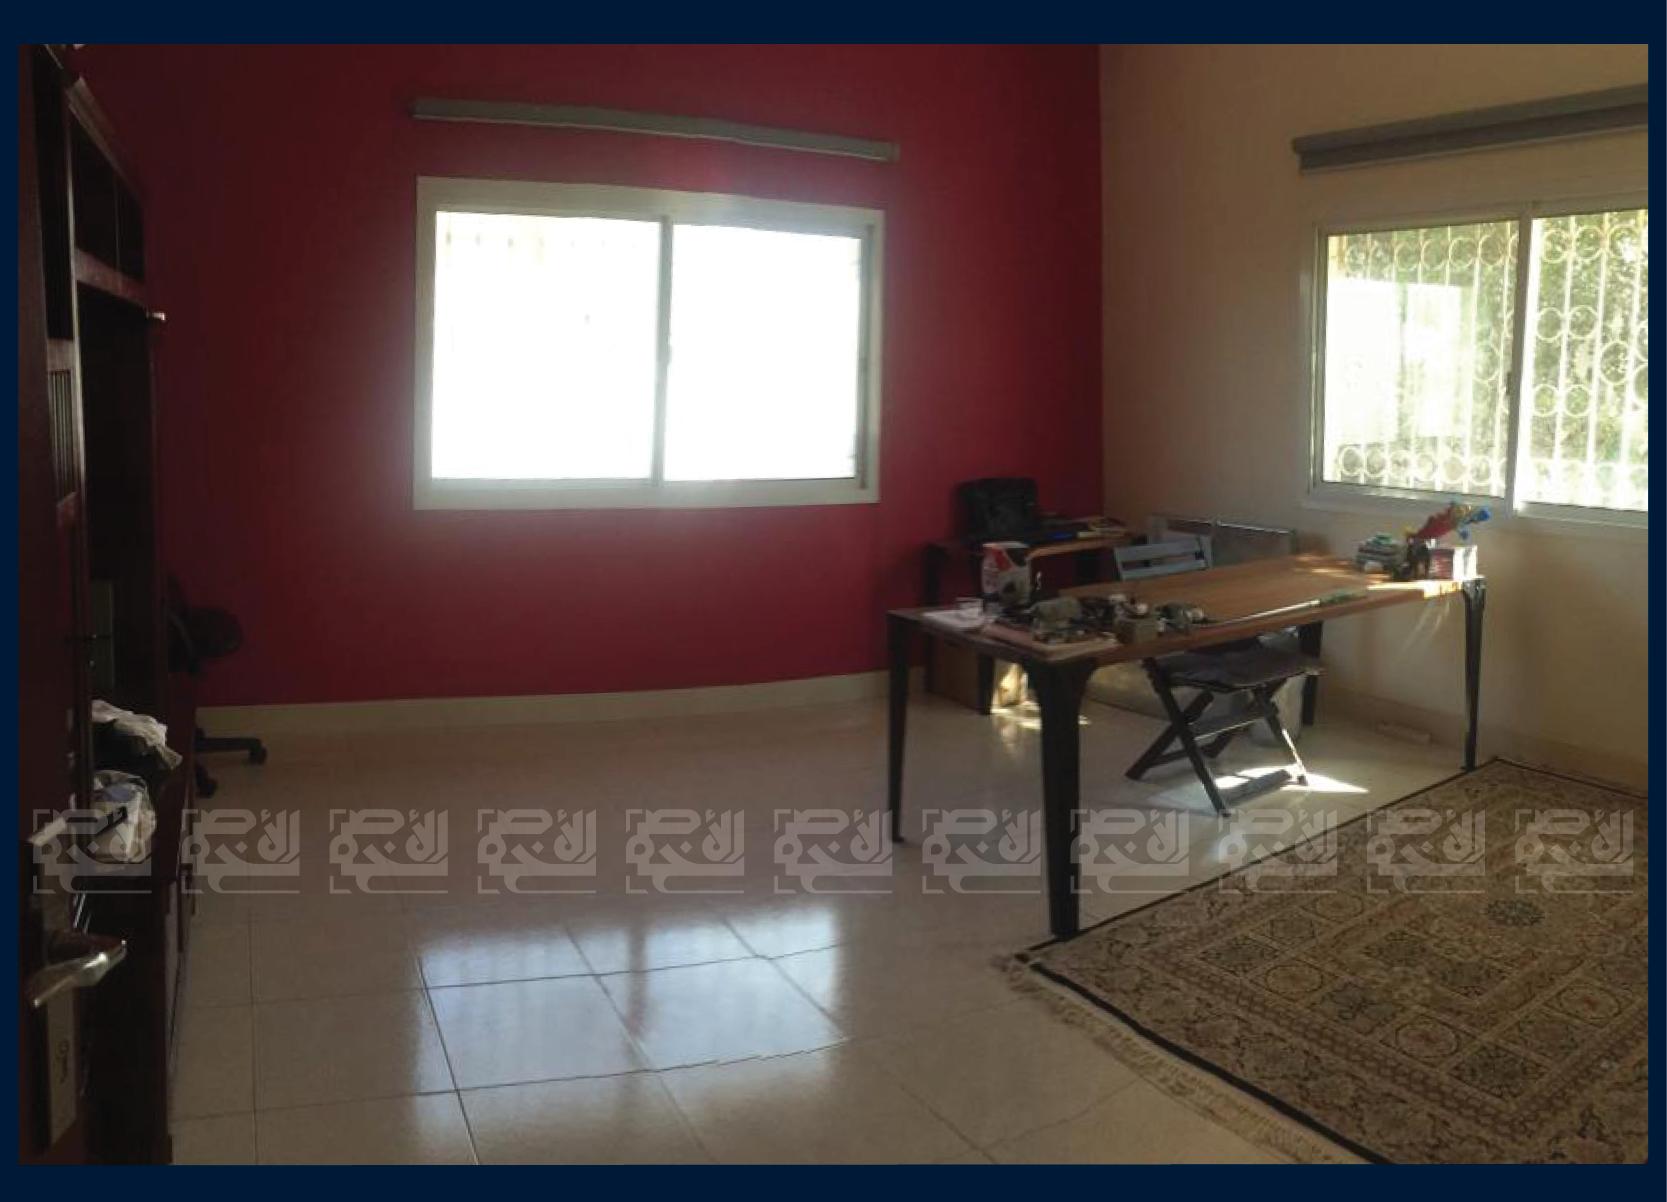 4 Bedrooms Standalone Villa in Al Dafna ( 4BR-Dafn